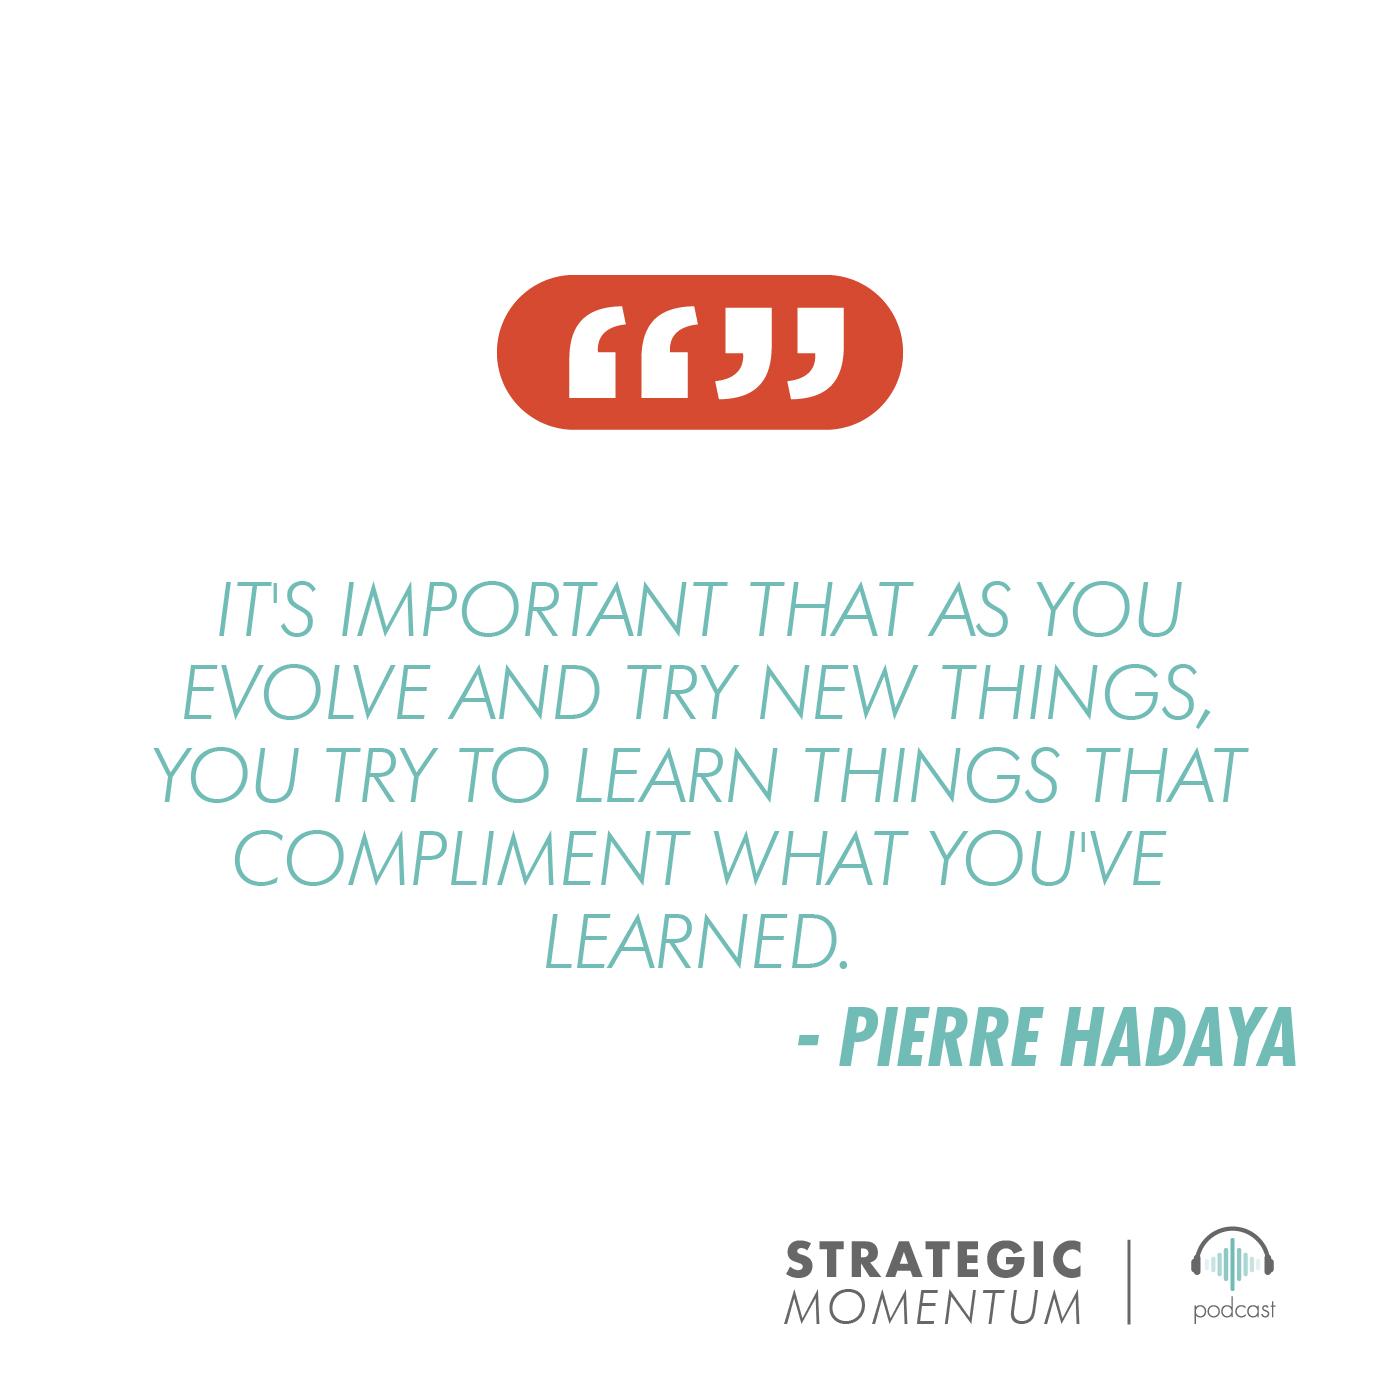 Pierre Hadaya Quote | Strategic Momentum Podcast